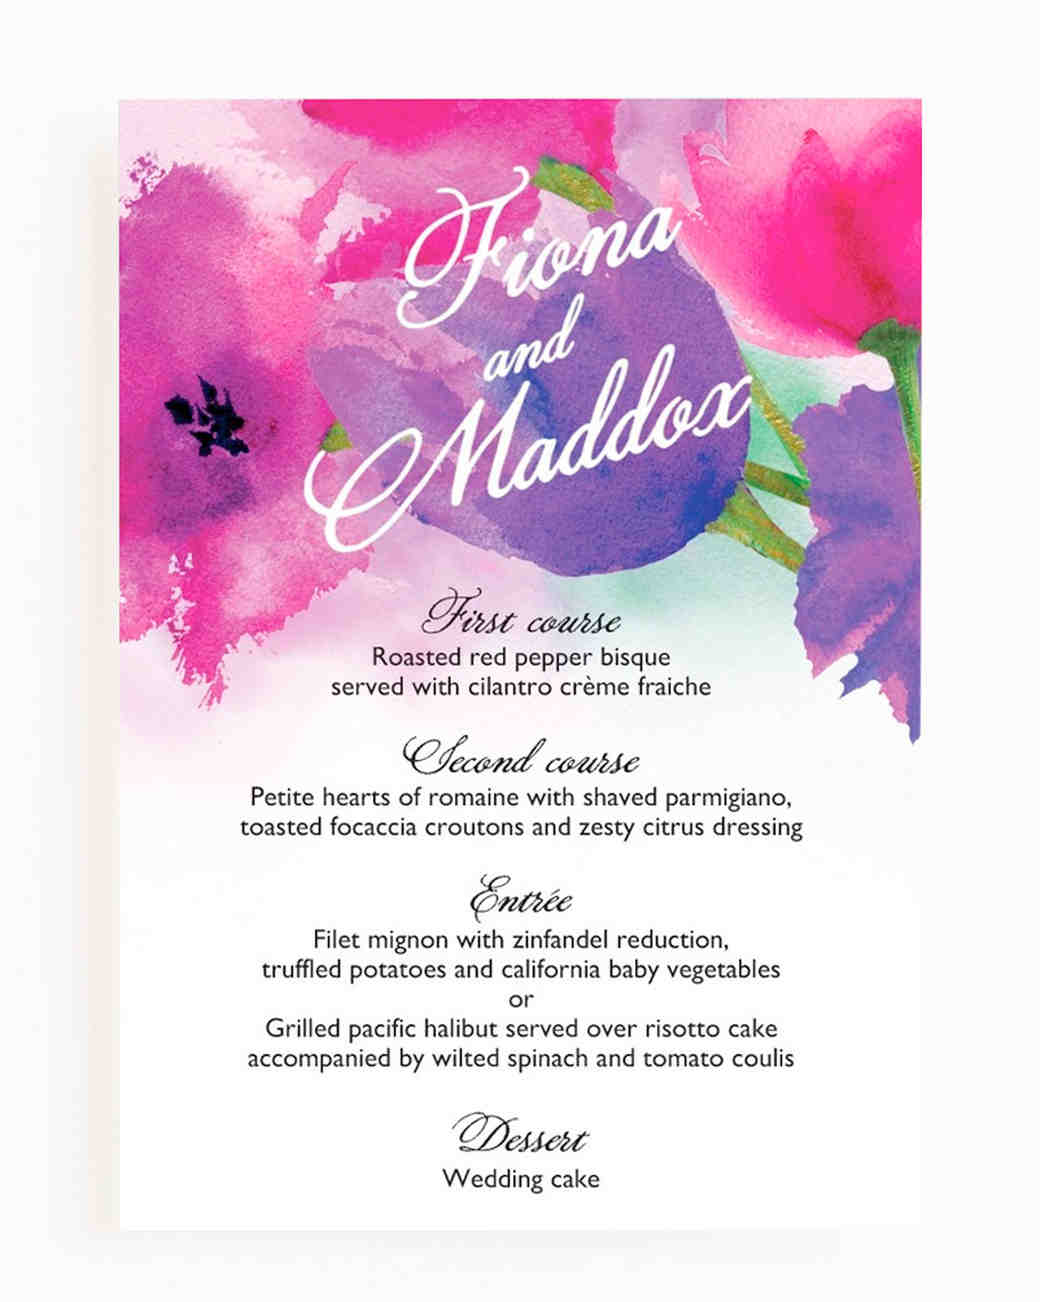 wedding-paper-divas-ceremony-reception-1135354-wpd-msw-menu-0914.jpg